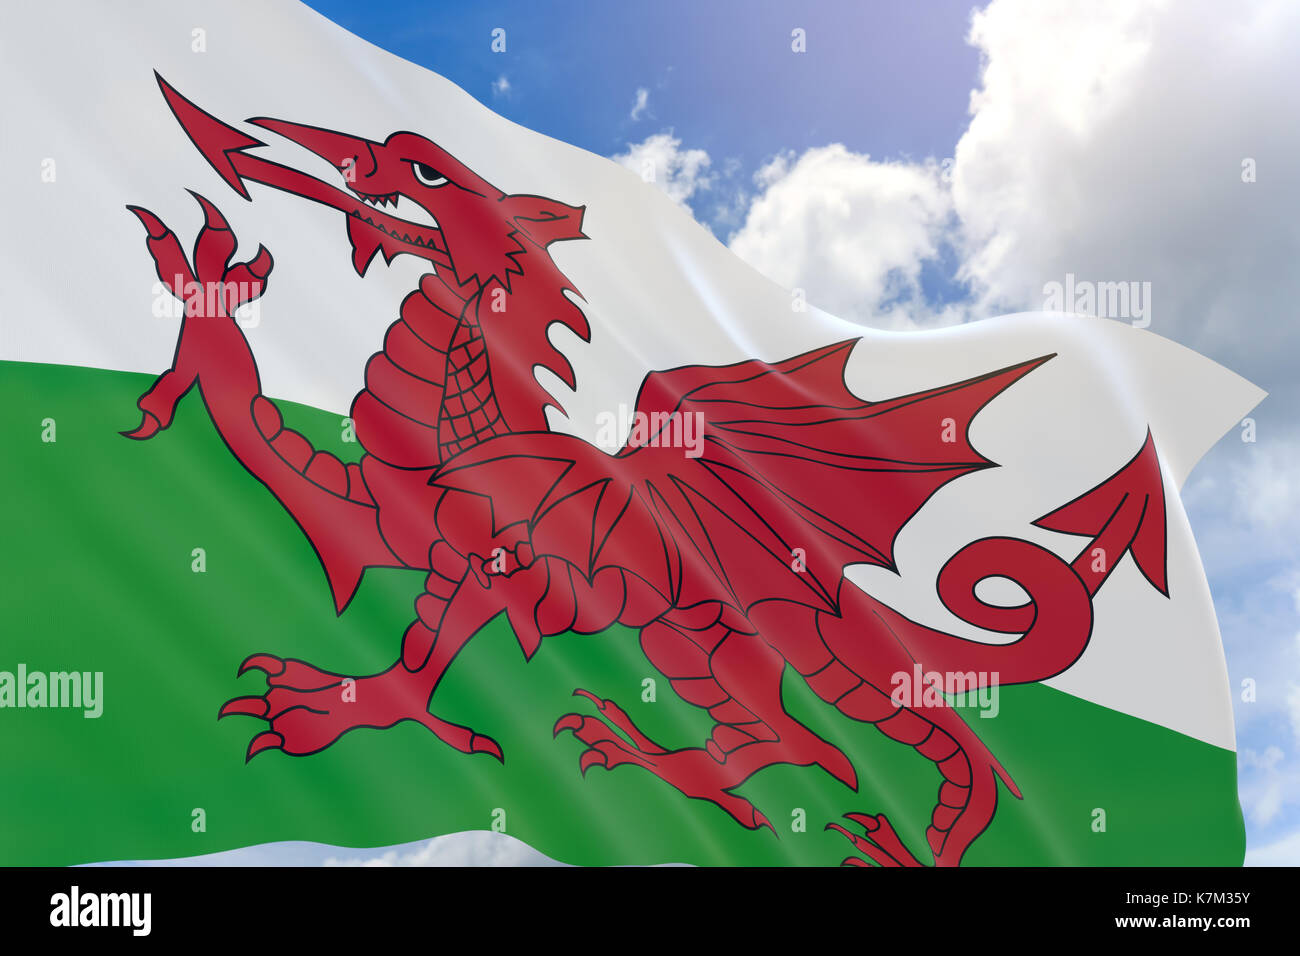 Welsh Dragon Illustration Imágenes De Stock & Welsh Dragon ...